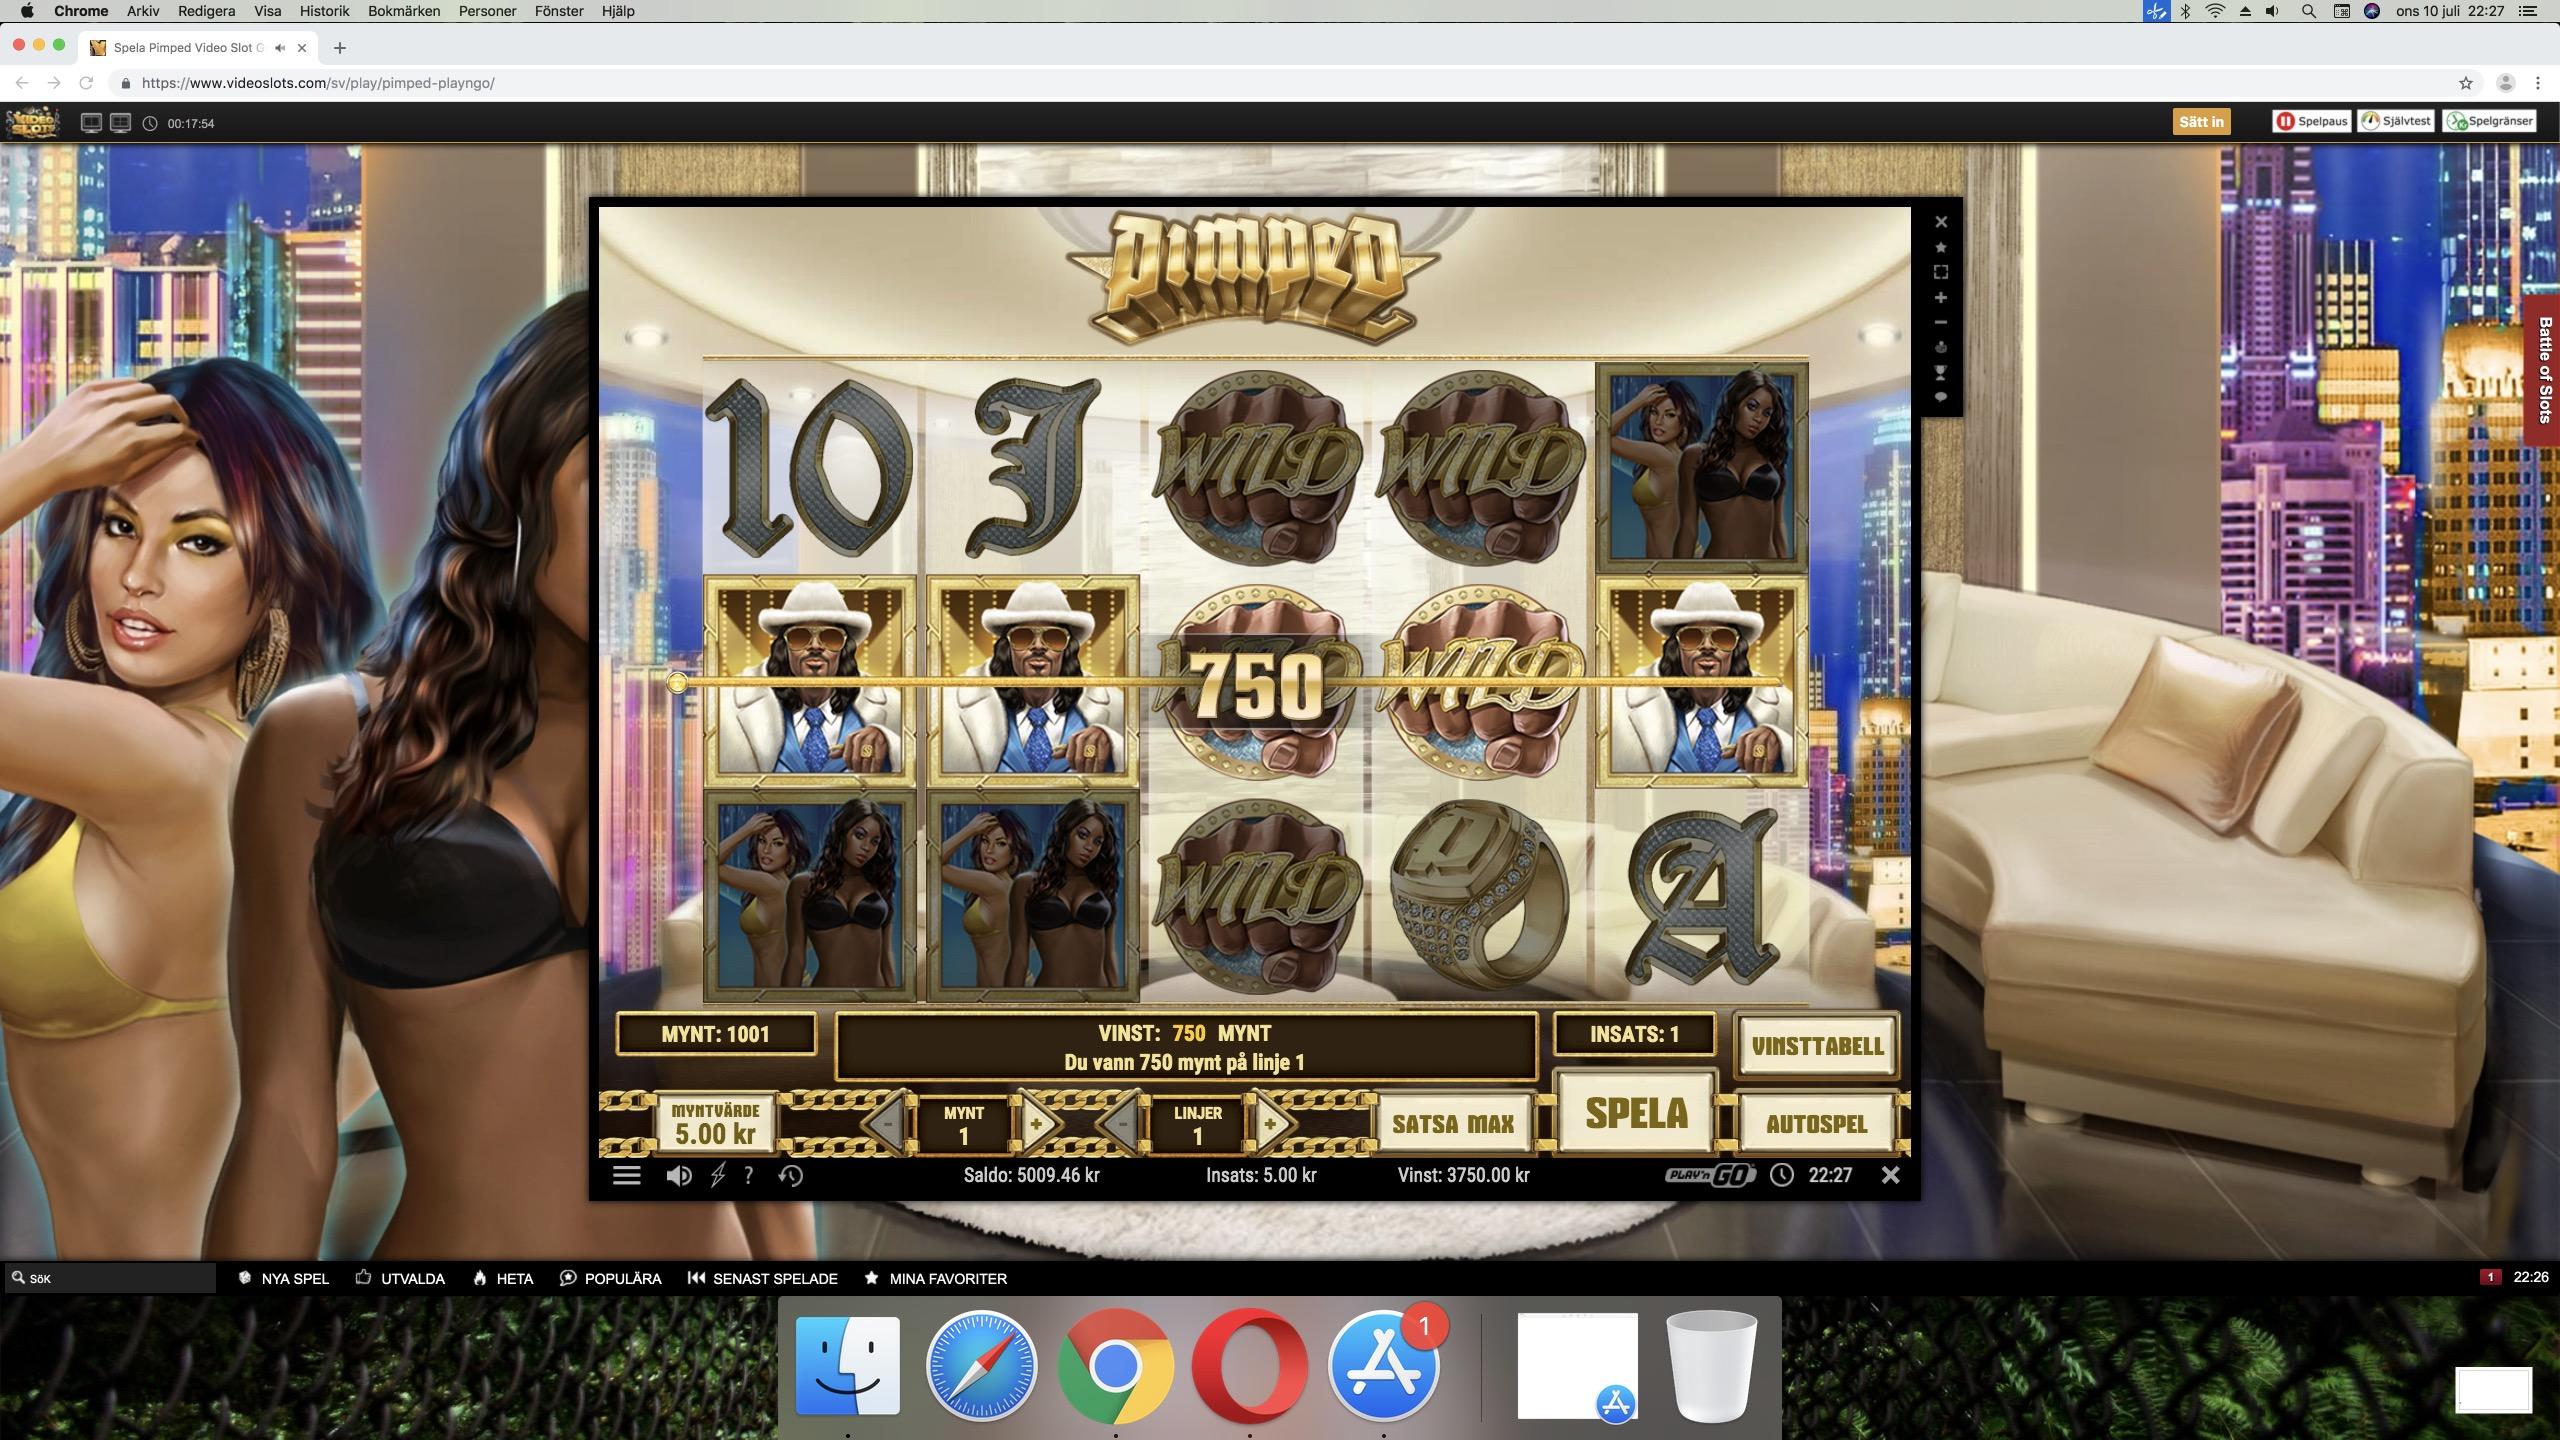 snezana Screenshot-2019-07-10_22-27-21-979